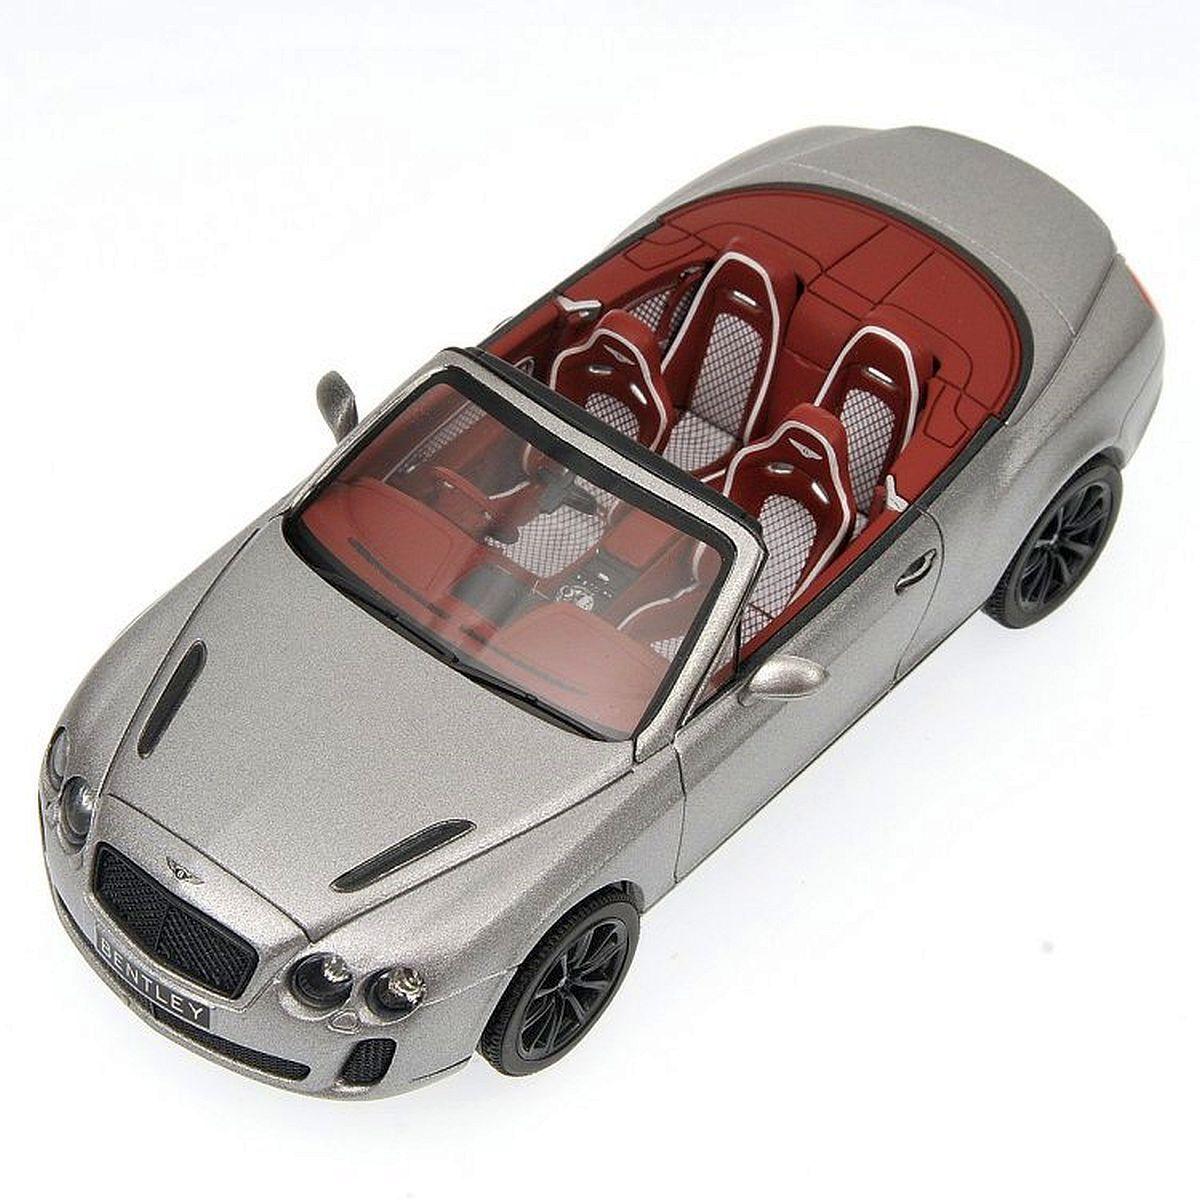 Minichamps 1 43  436139970 Bentley Continental Supersports Congreenible (2010)